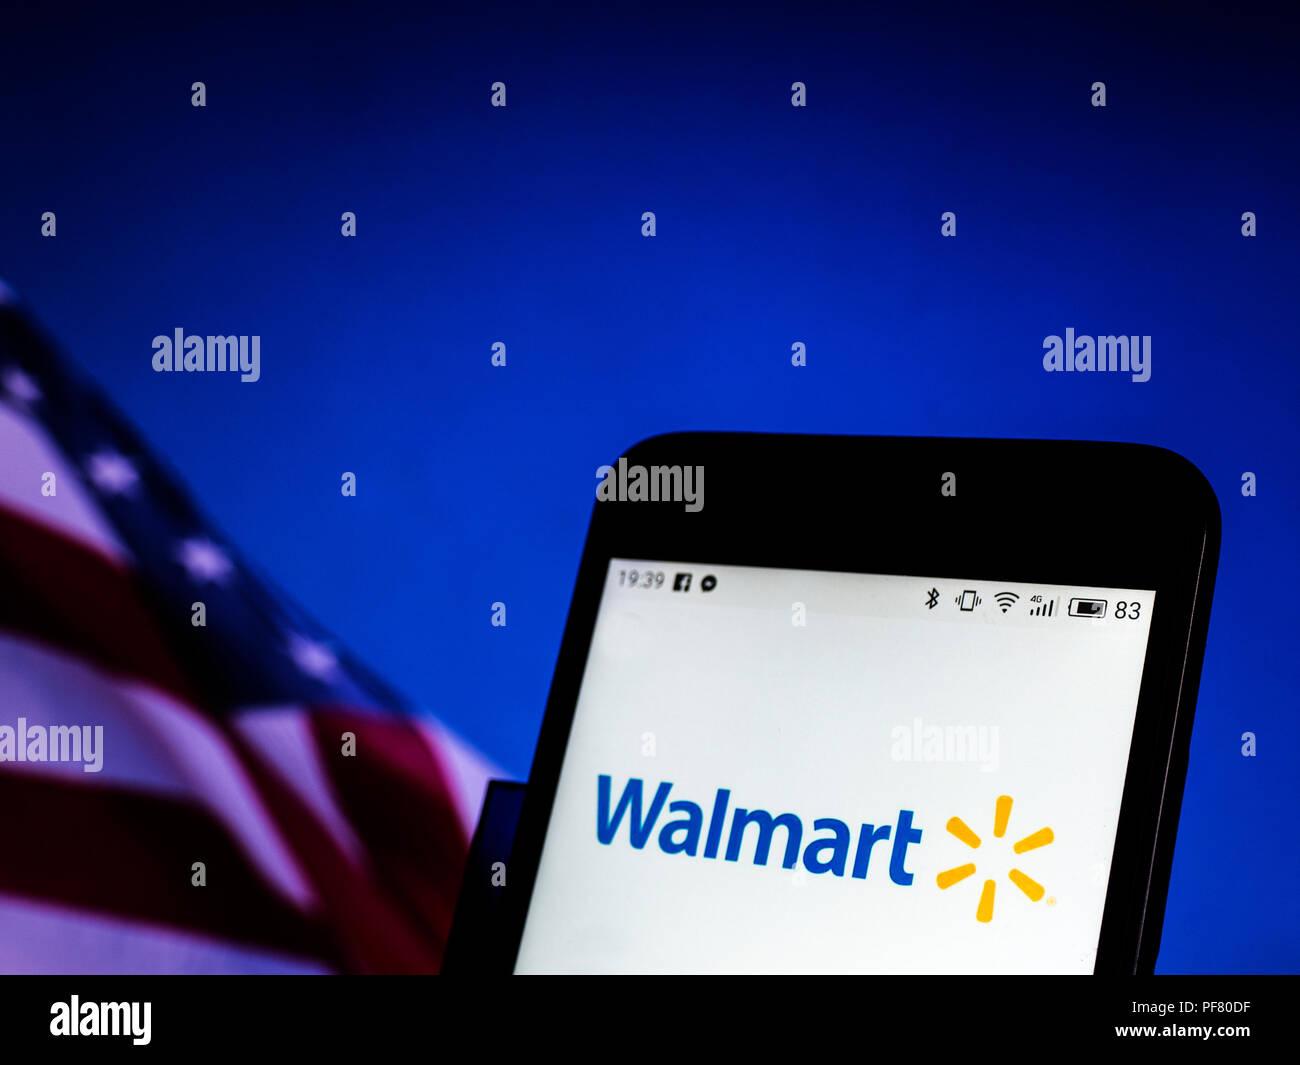 Walmart Stock Phone Number >> Walmart Company Logo Seen Displayed On A Smart Phone Stock